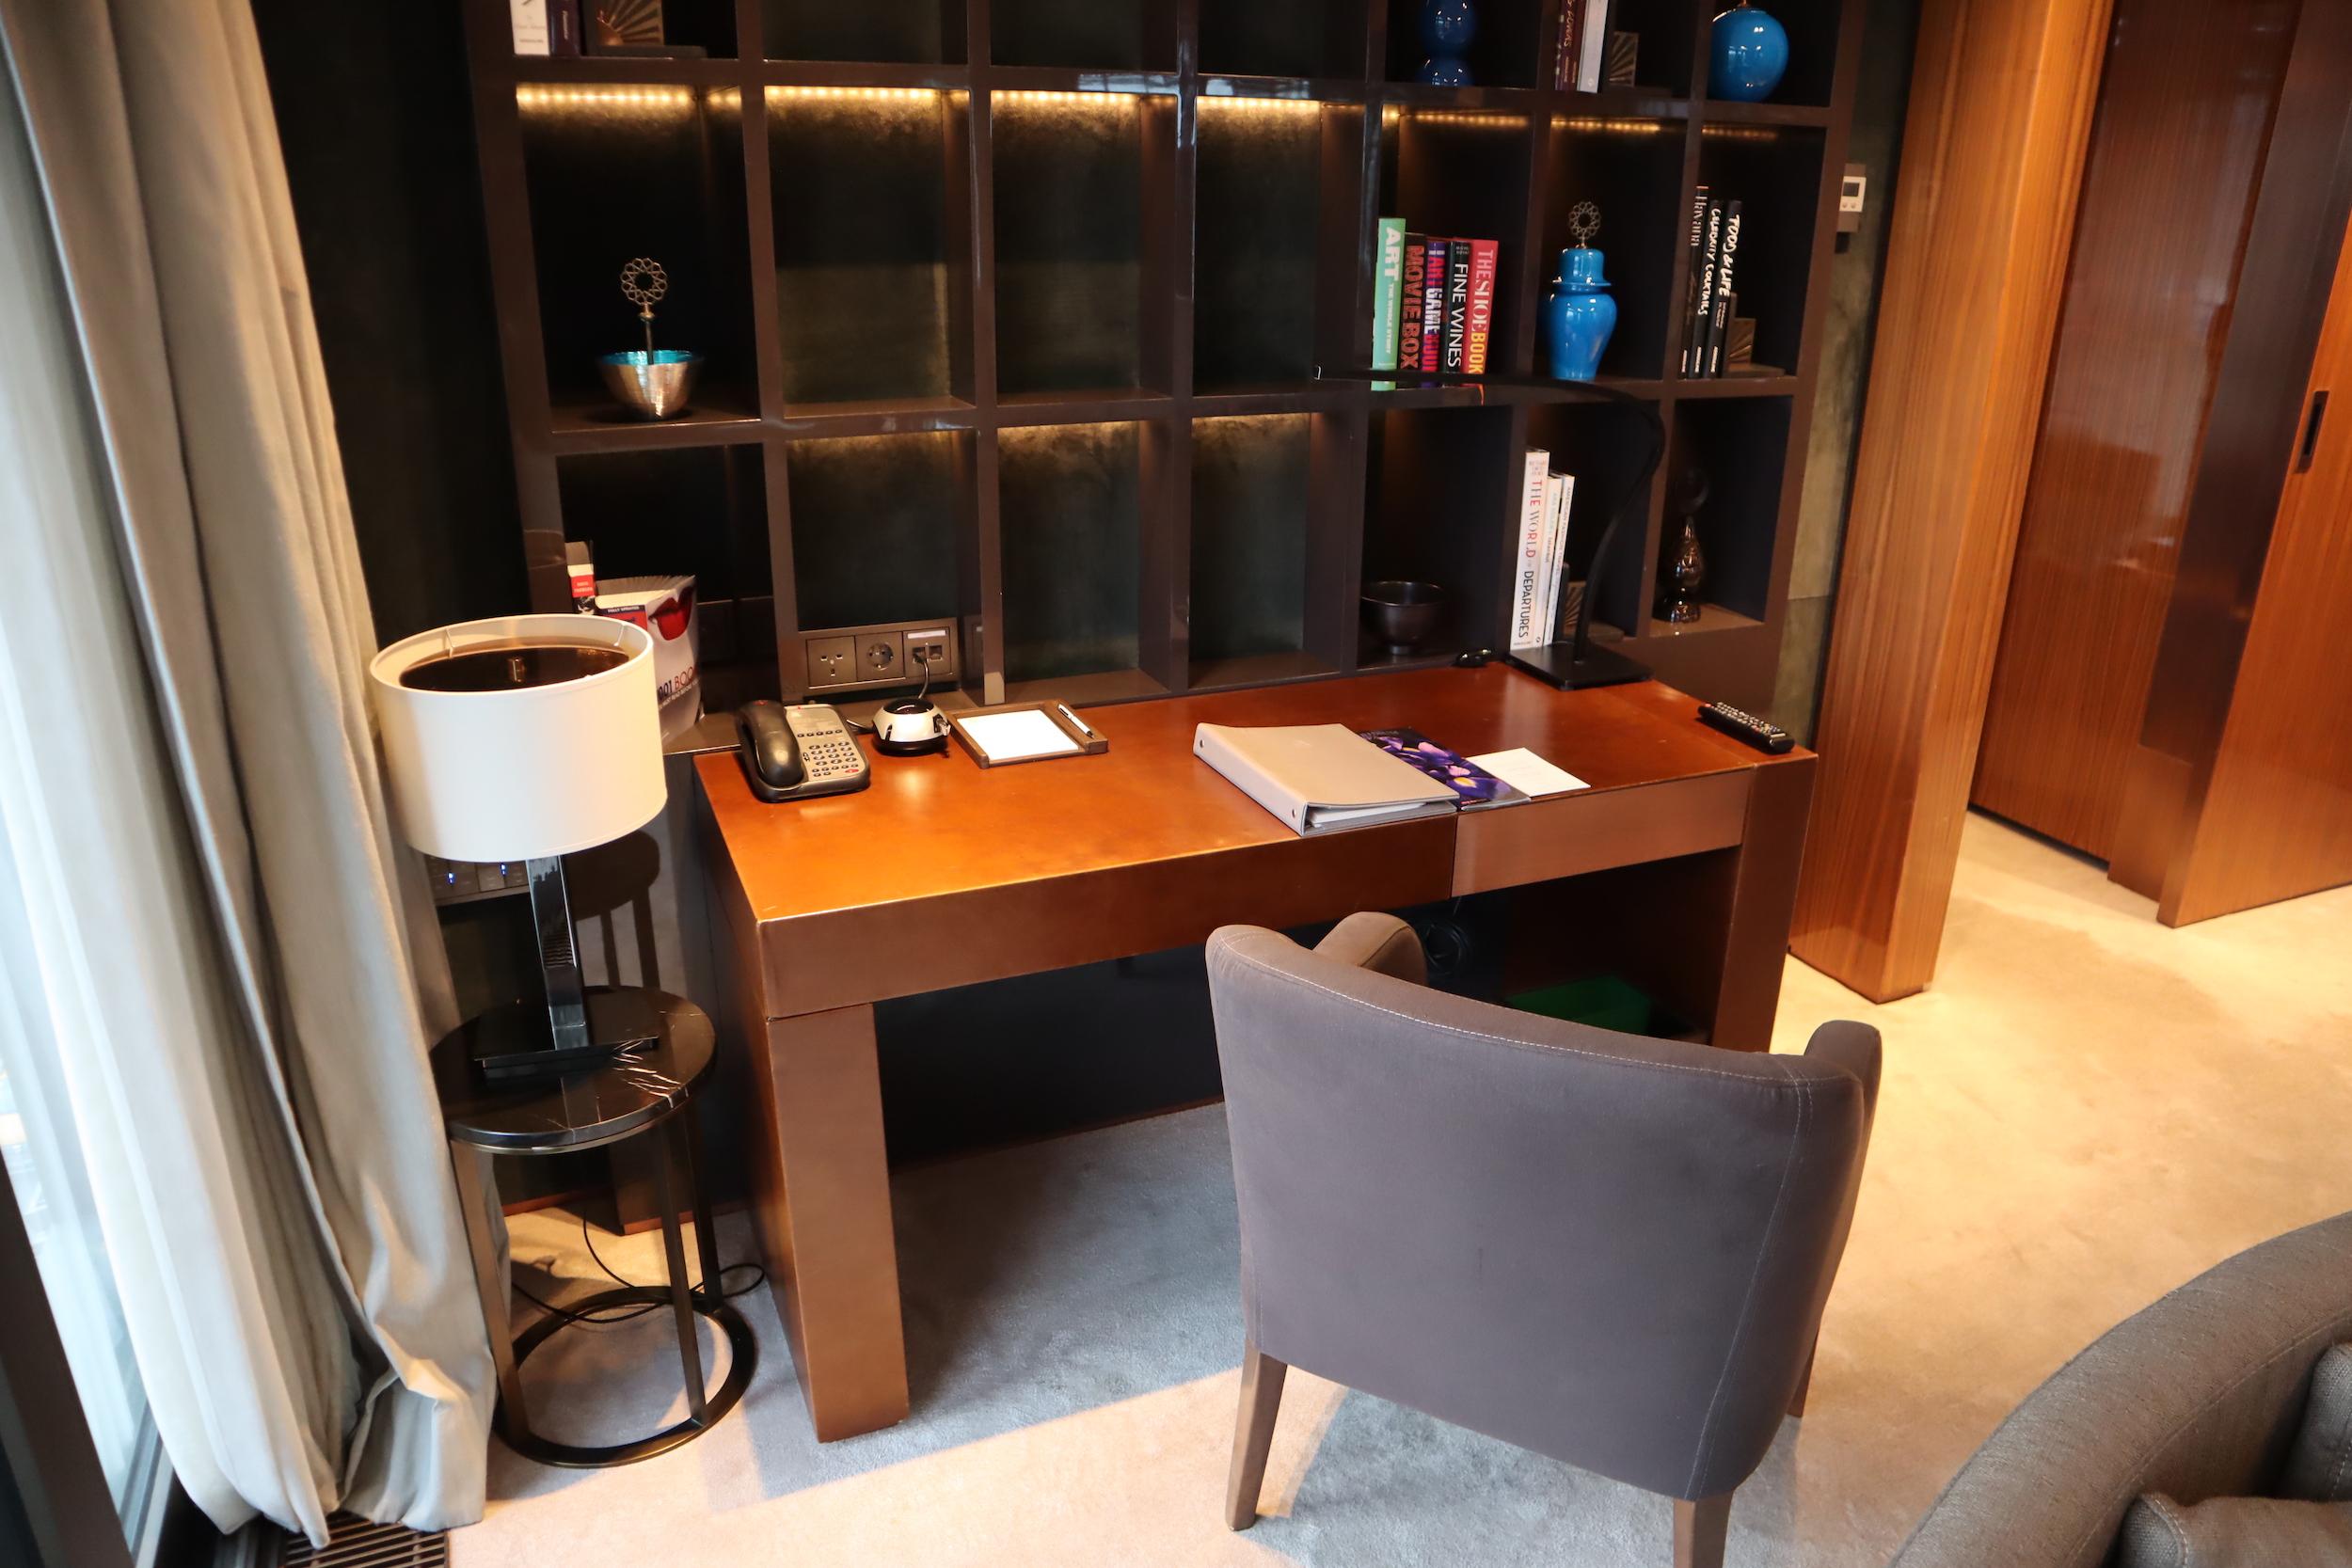 St. Regis Istanbul – St. Regis Suite desk